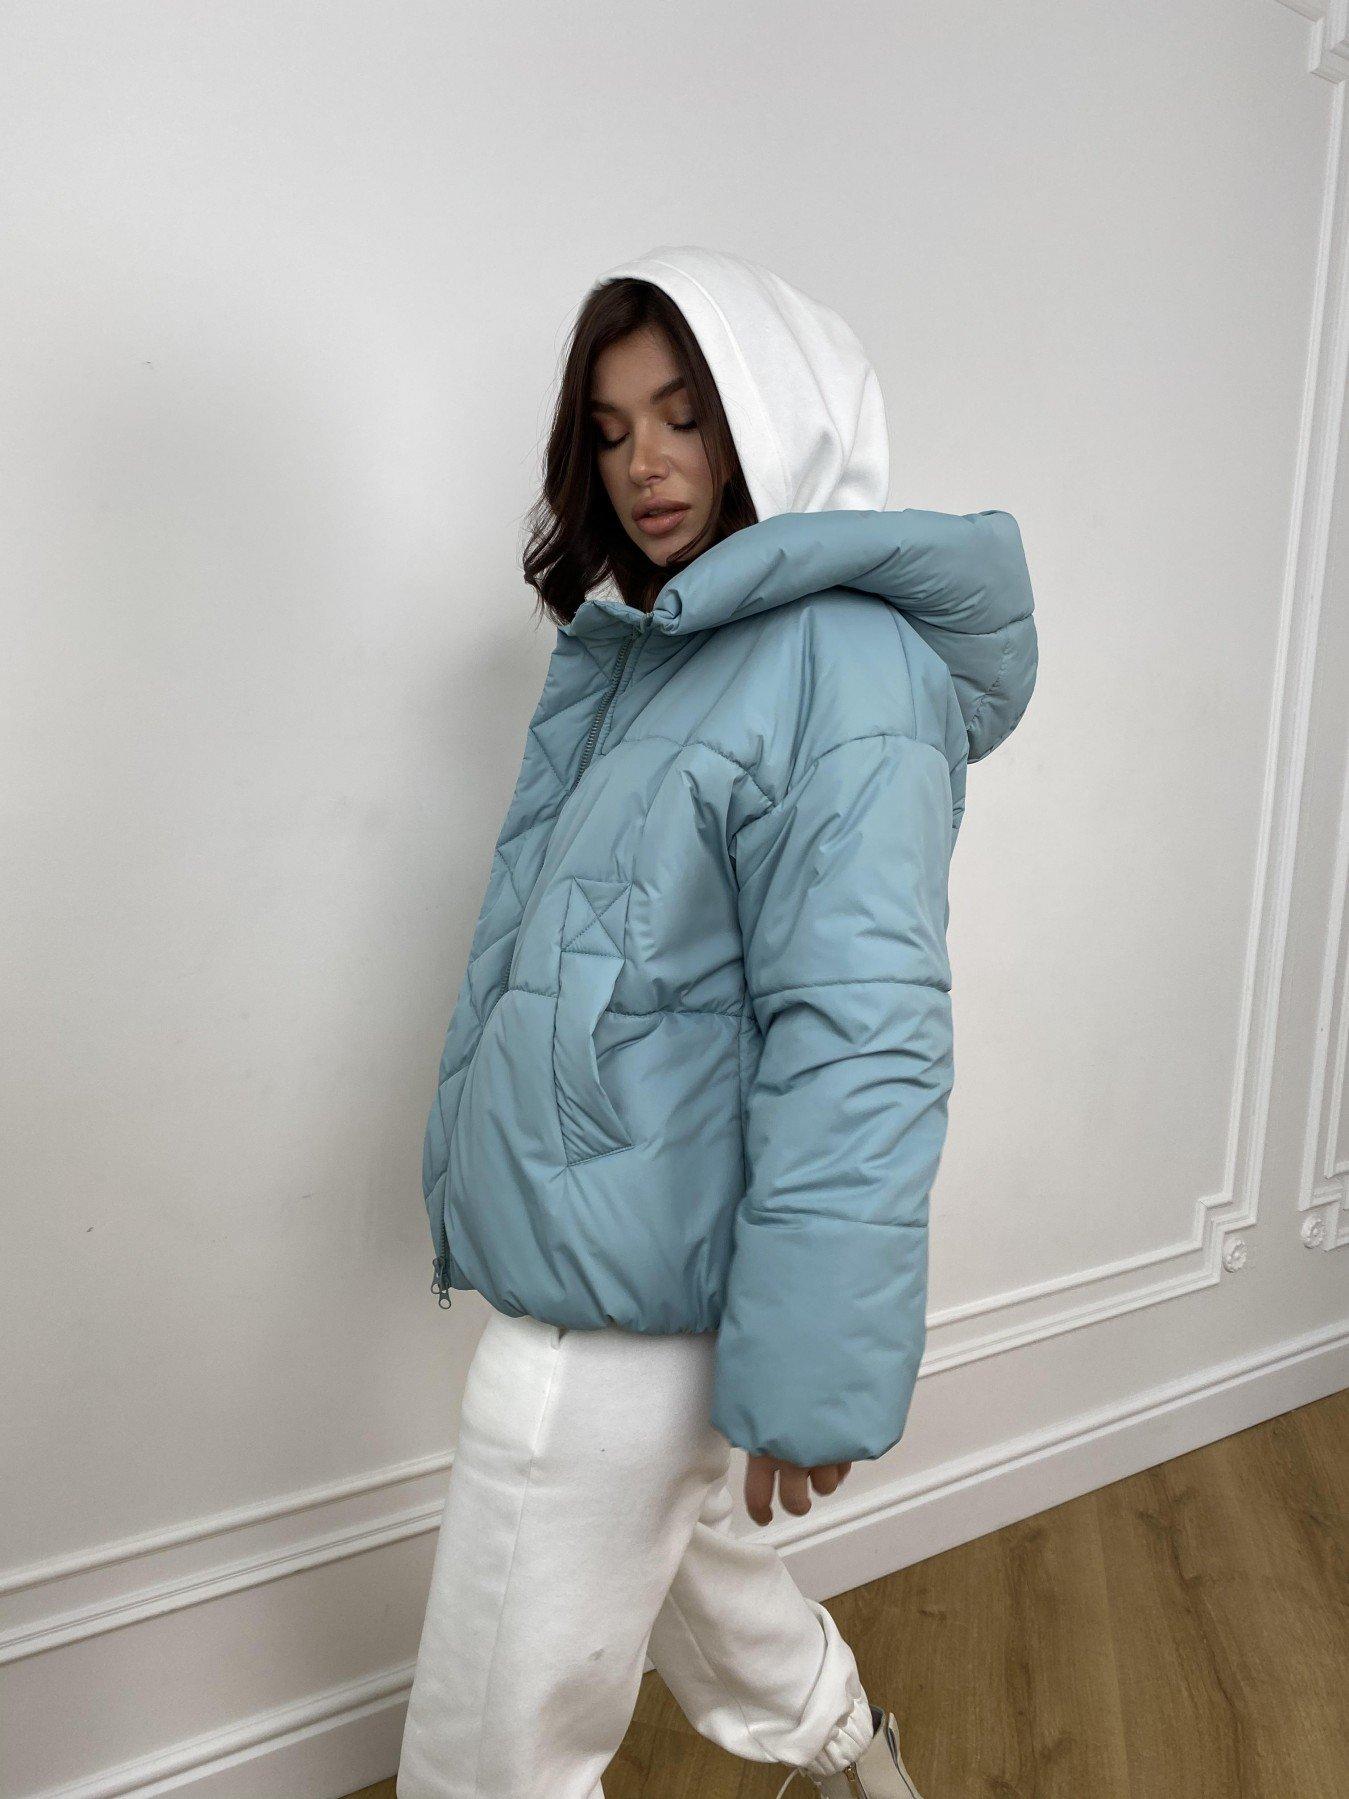 Нокс куртка  из плащевой ткани Astra 10994 АРТ. 47484 Цвет: Олива Astra - фото 5, интернет магазин tm-modus.ru